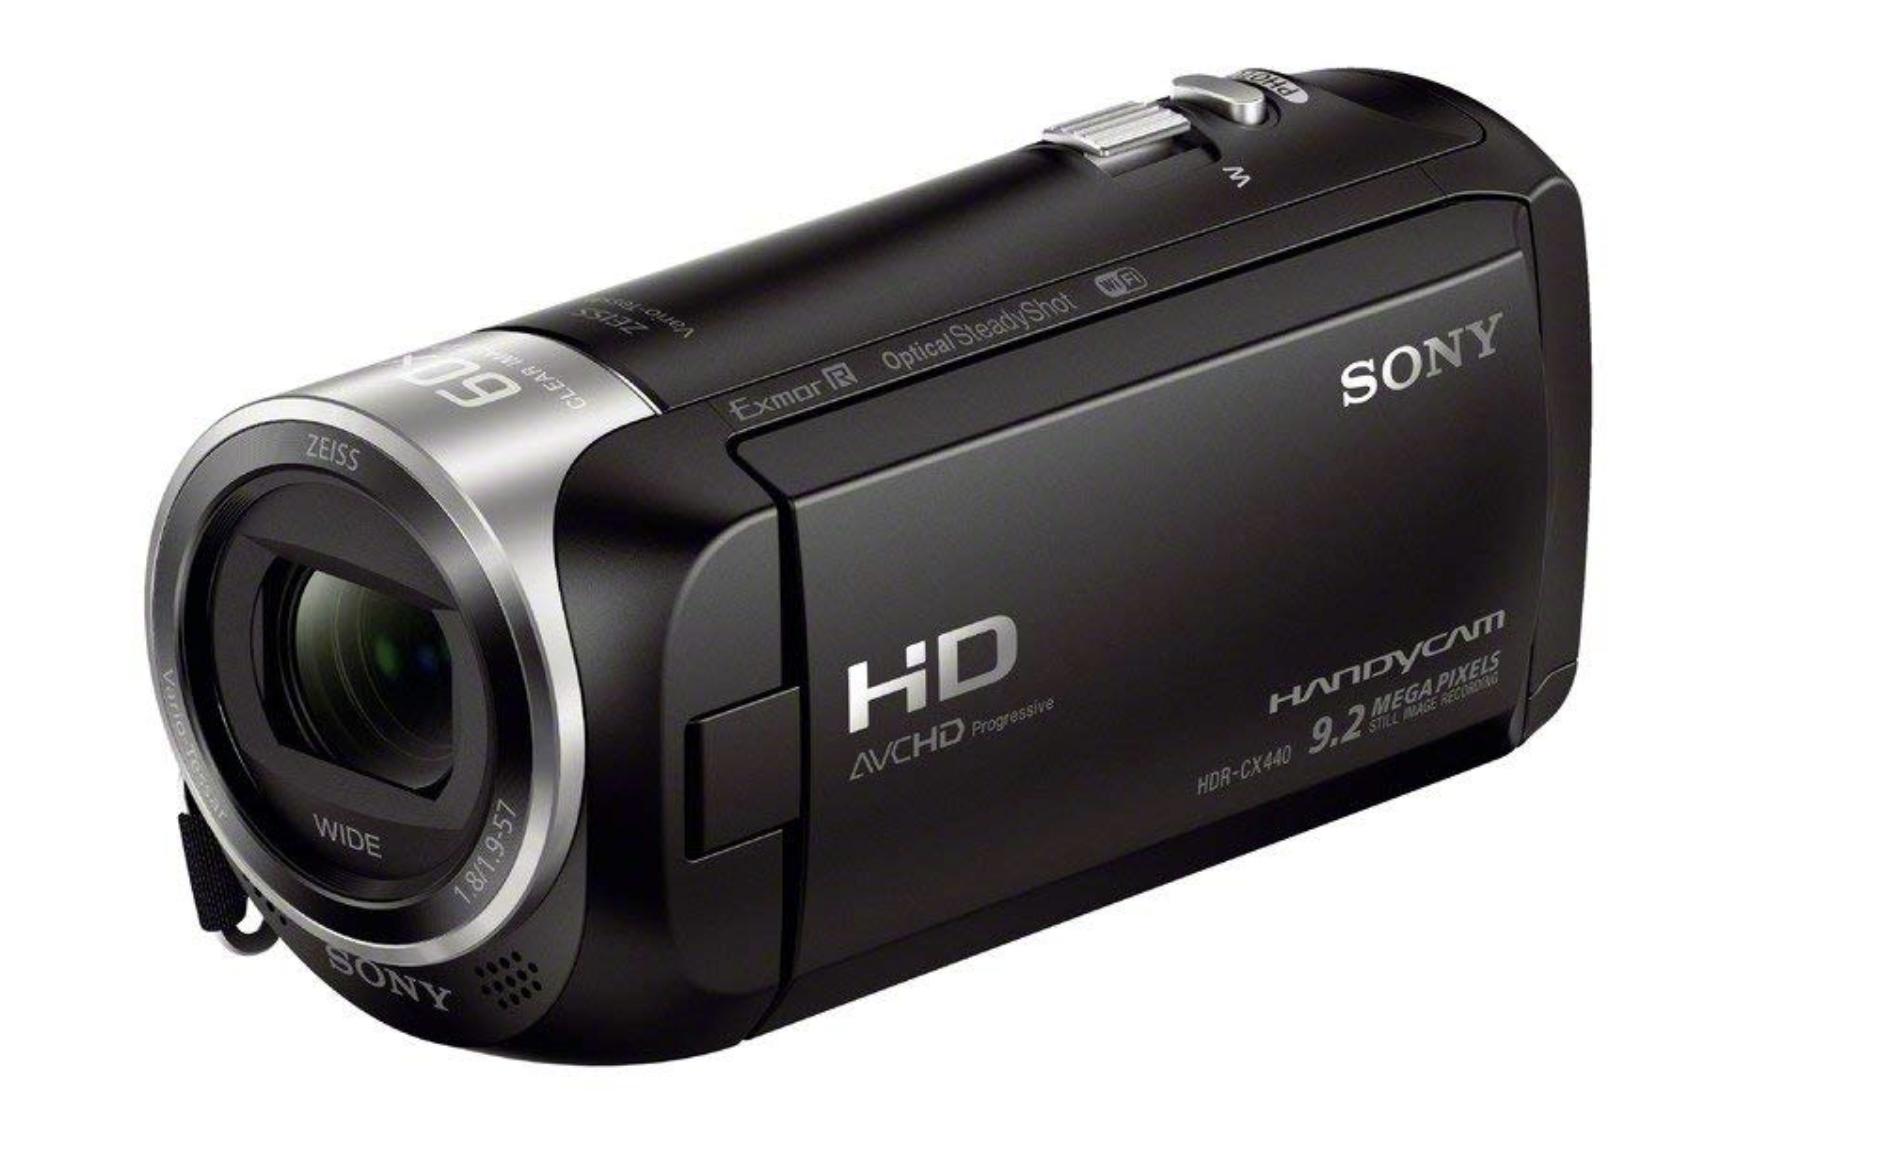 SonyHDRCX440 Handycam